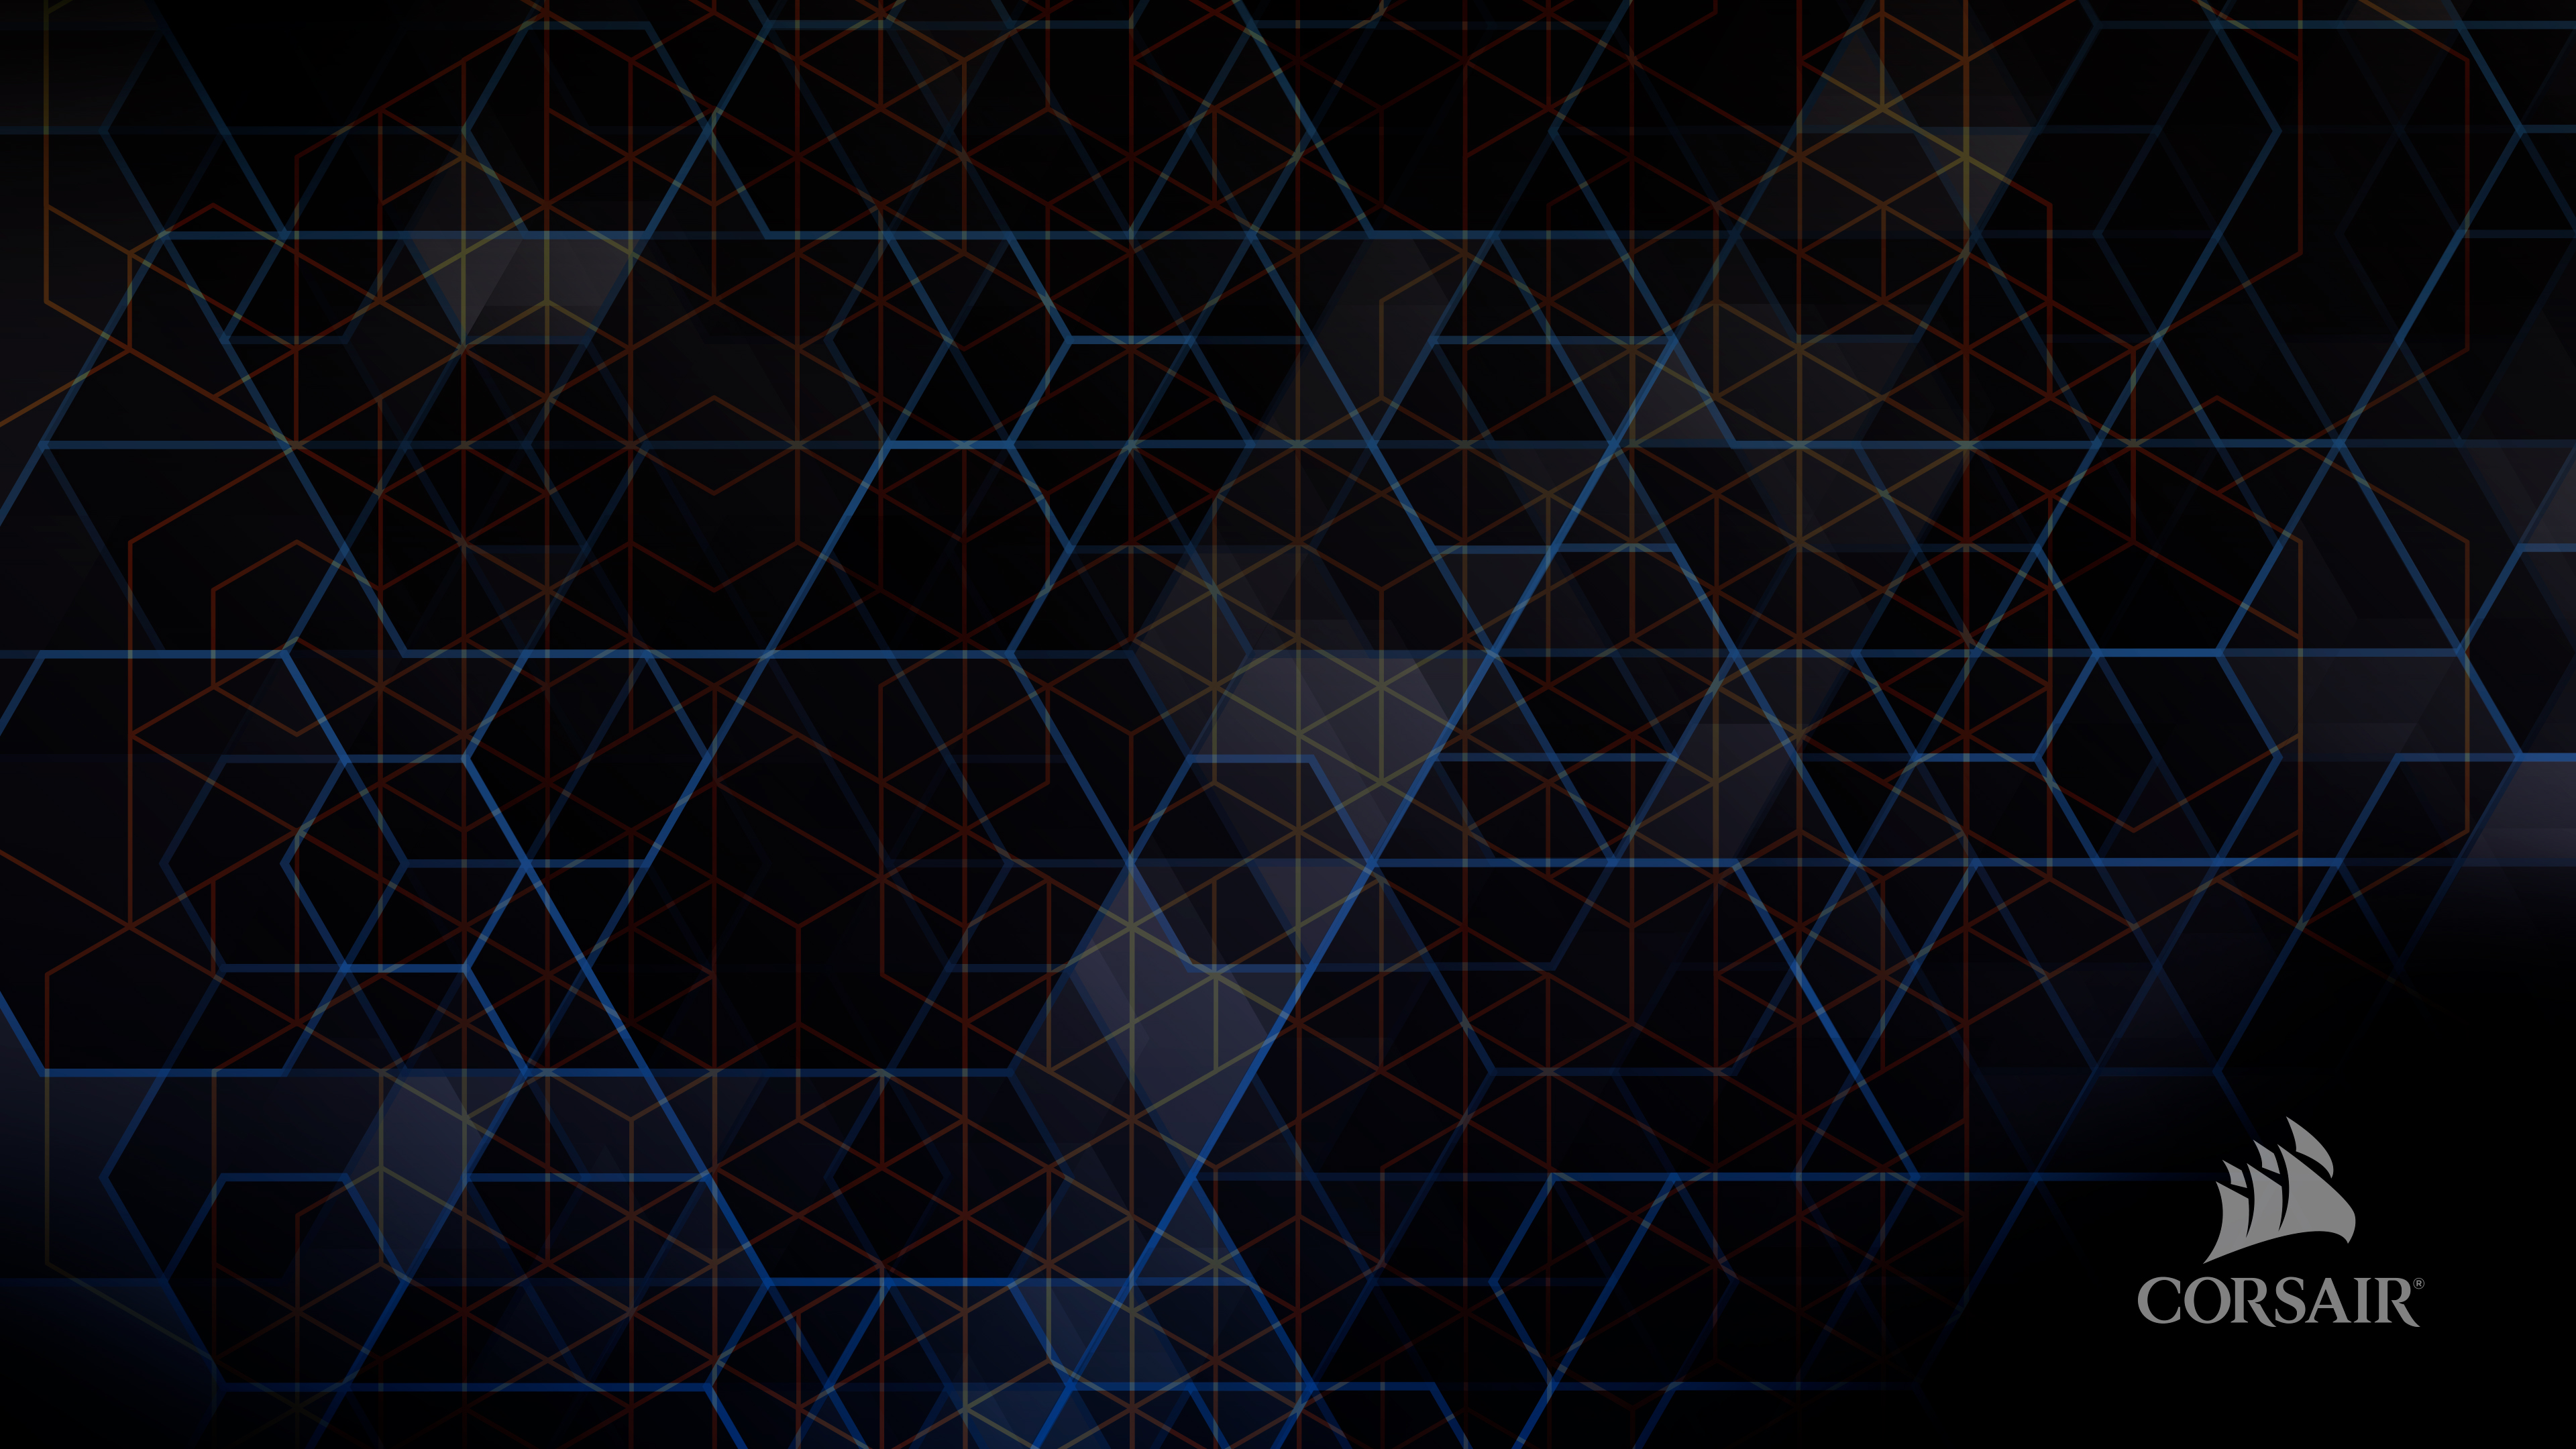 10 Top Black And Blue Shards Wallpaper Full Hd 1080p For: 커세어 월페이퍼 (4K)